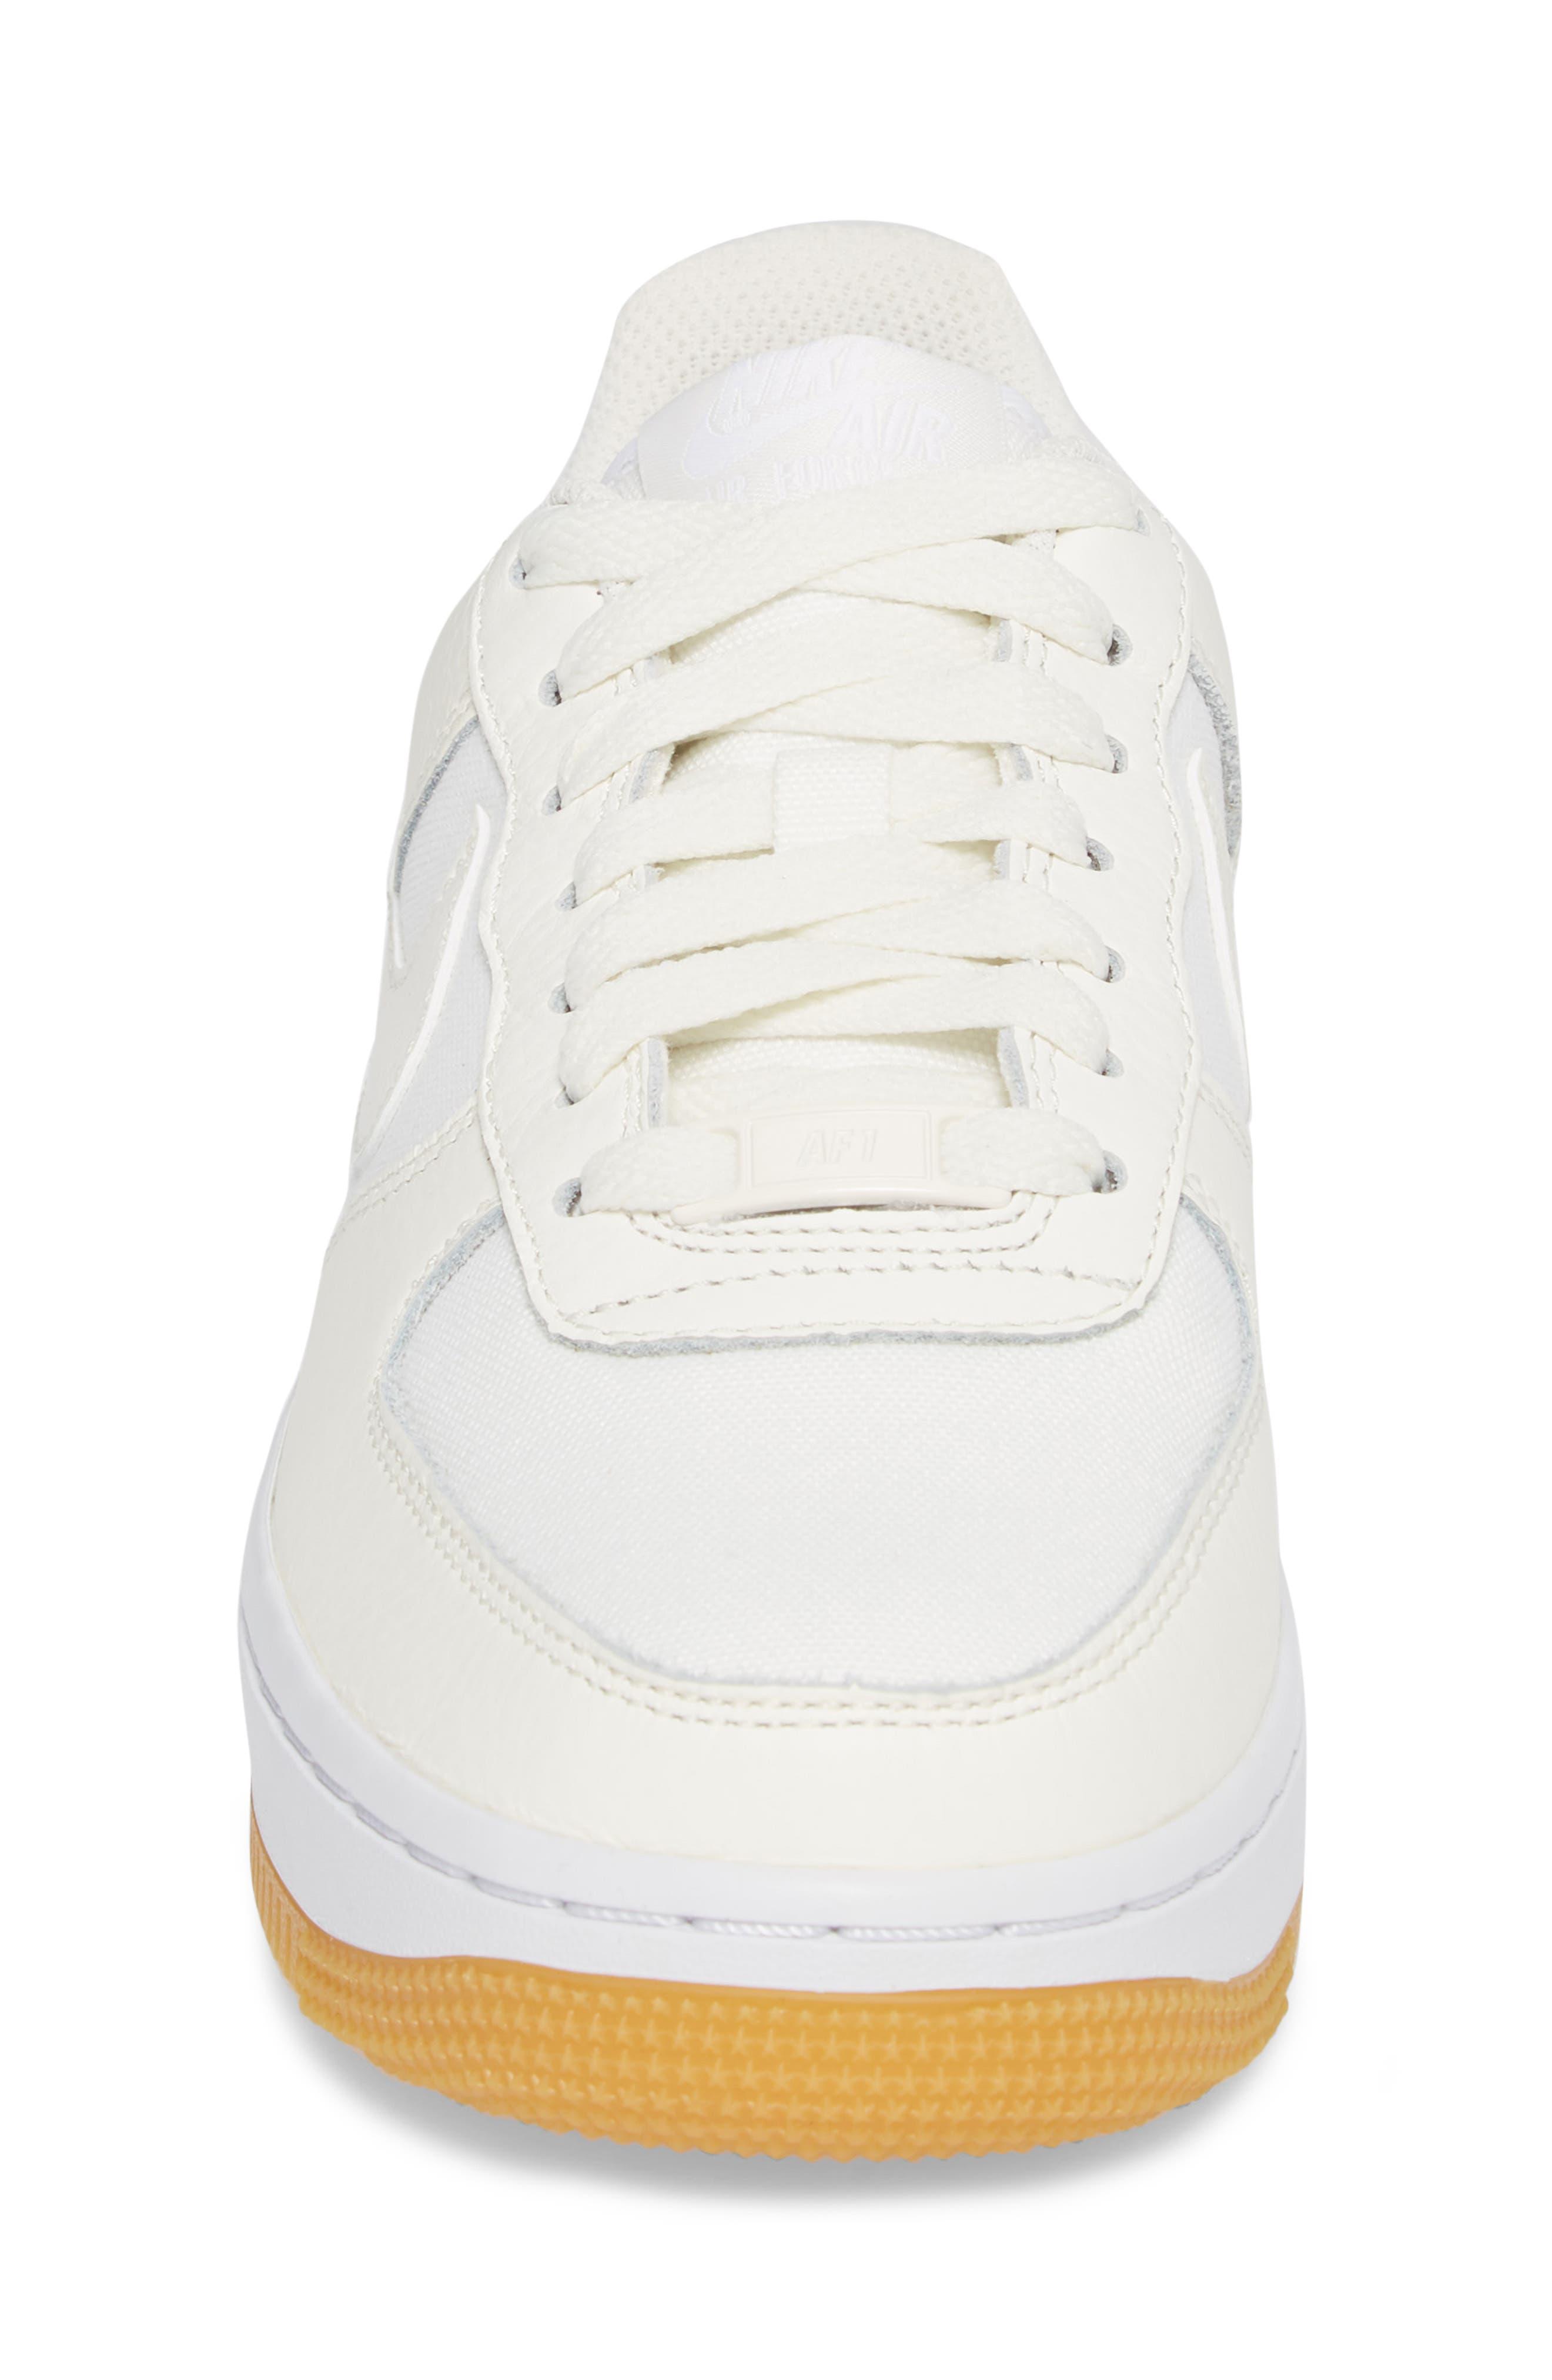 Air Force 1 '07 Premium Sneaker,                             Alternate thumbnail 4, color,                             Sail/ White/ Light Brown